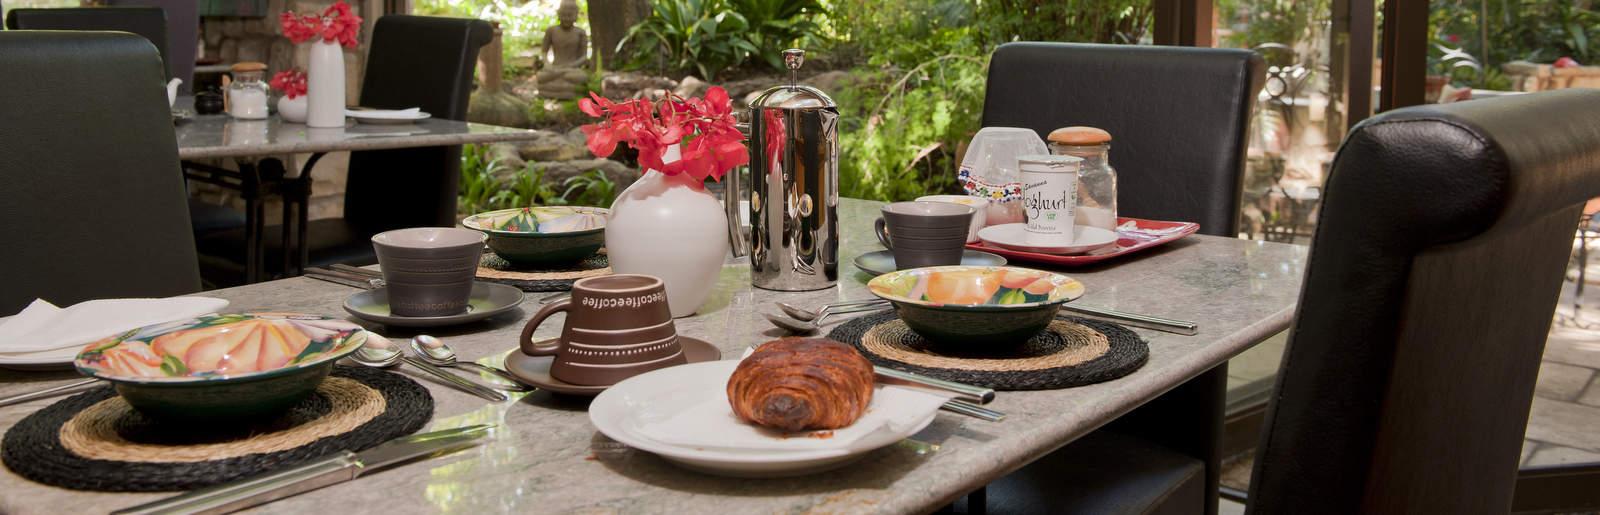 Amanzi Guest House - Breakfast on patio